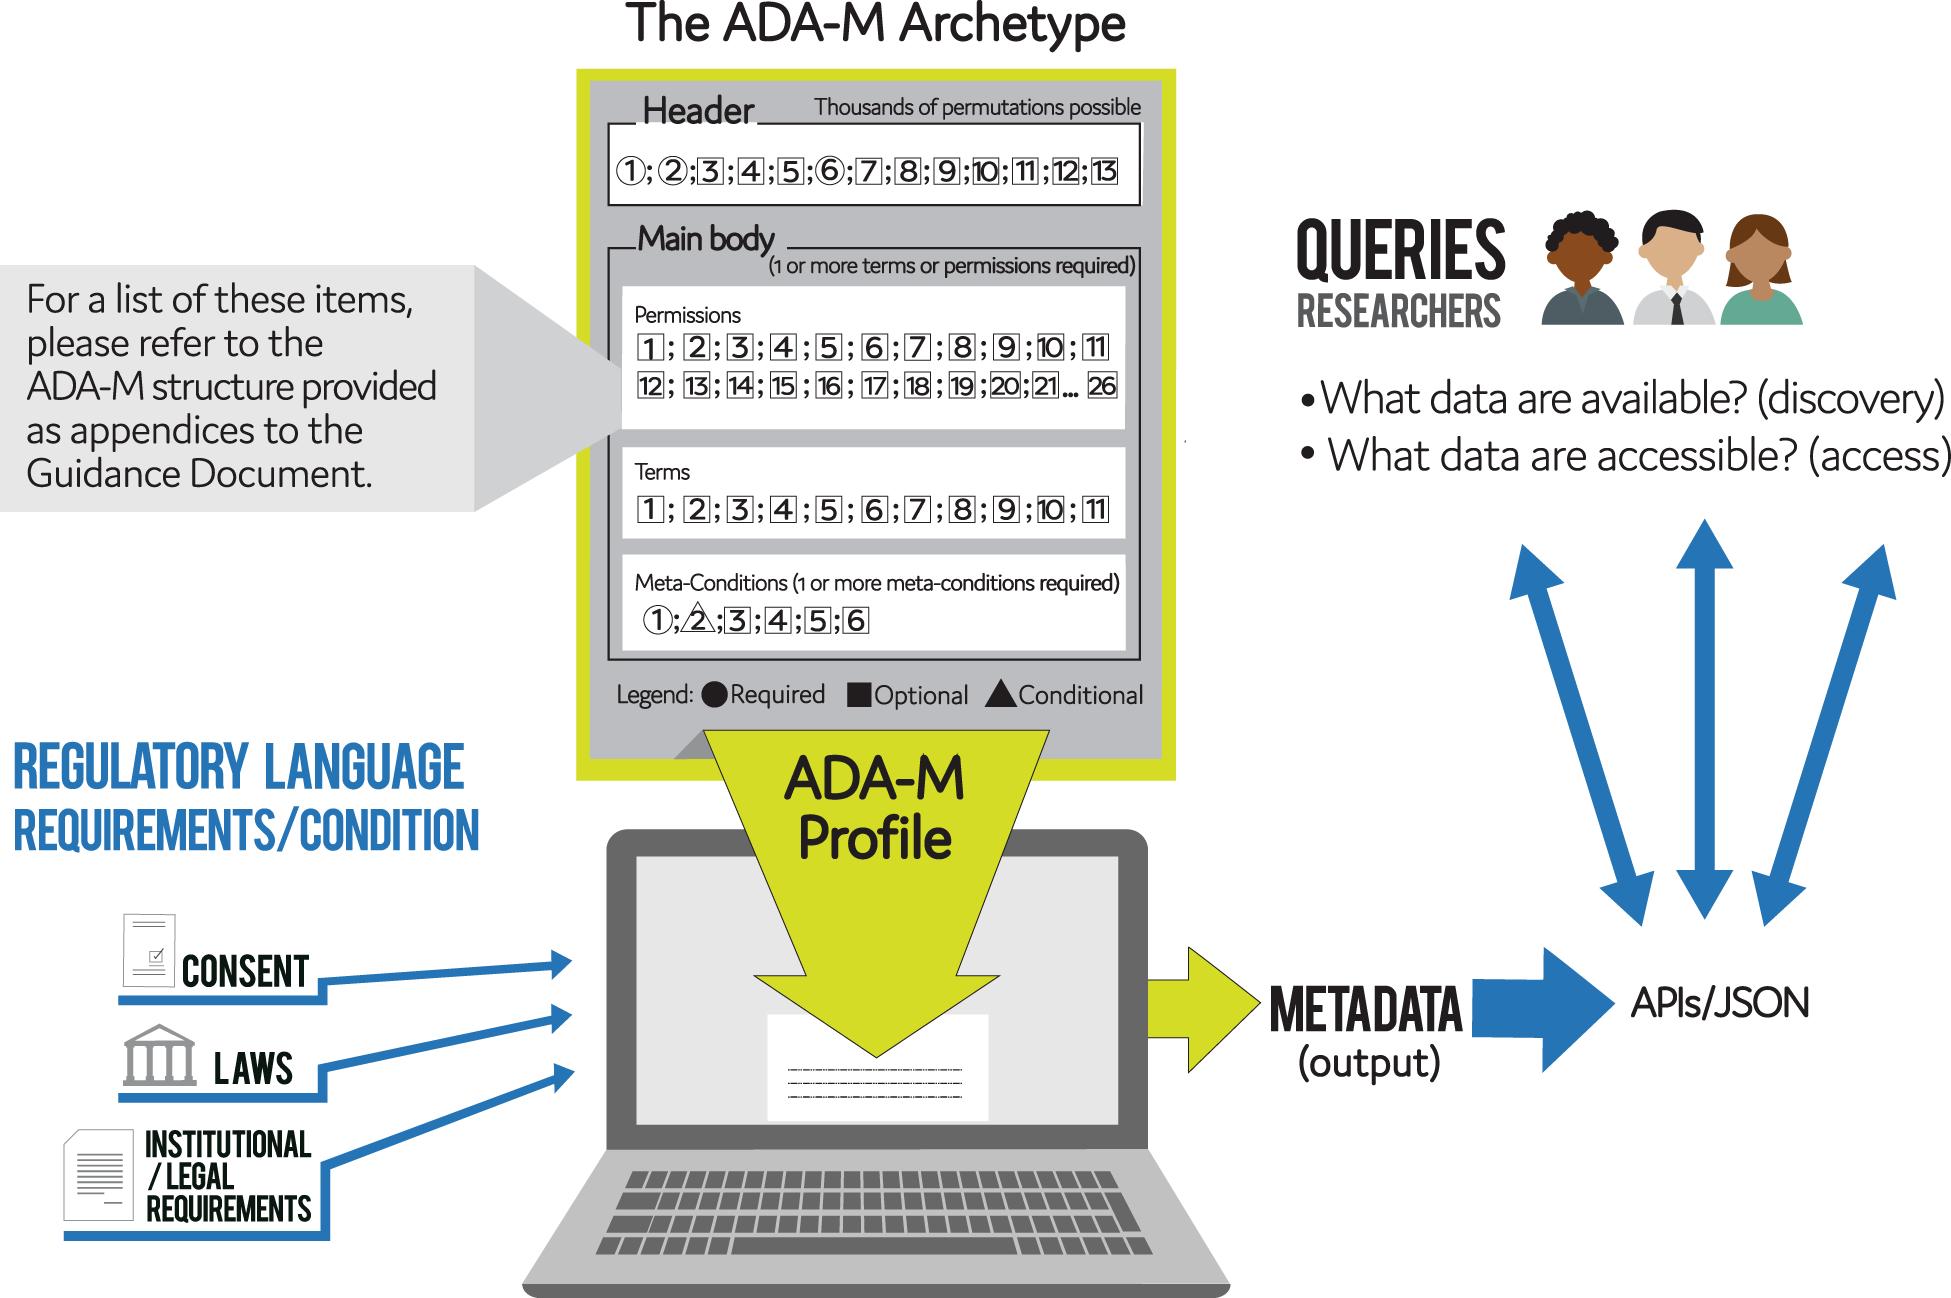 Responsible sharing of biomedical data and biospecimens via